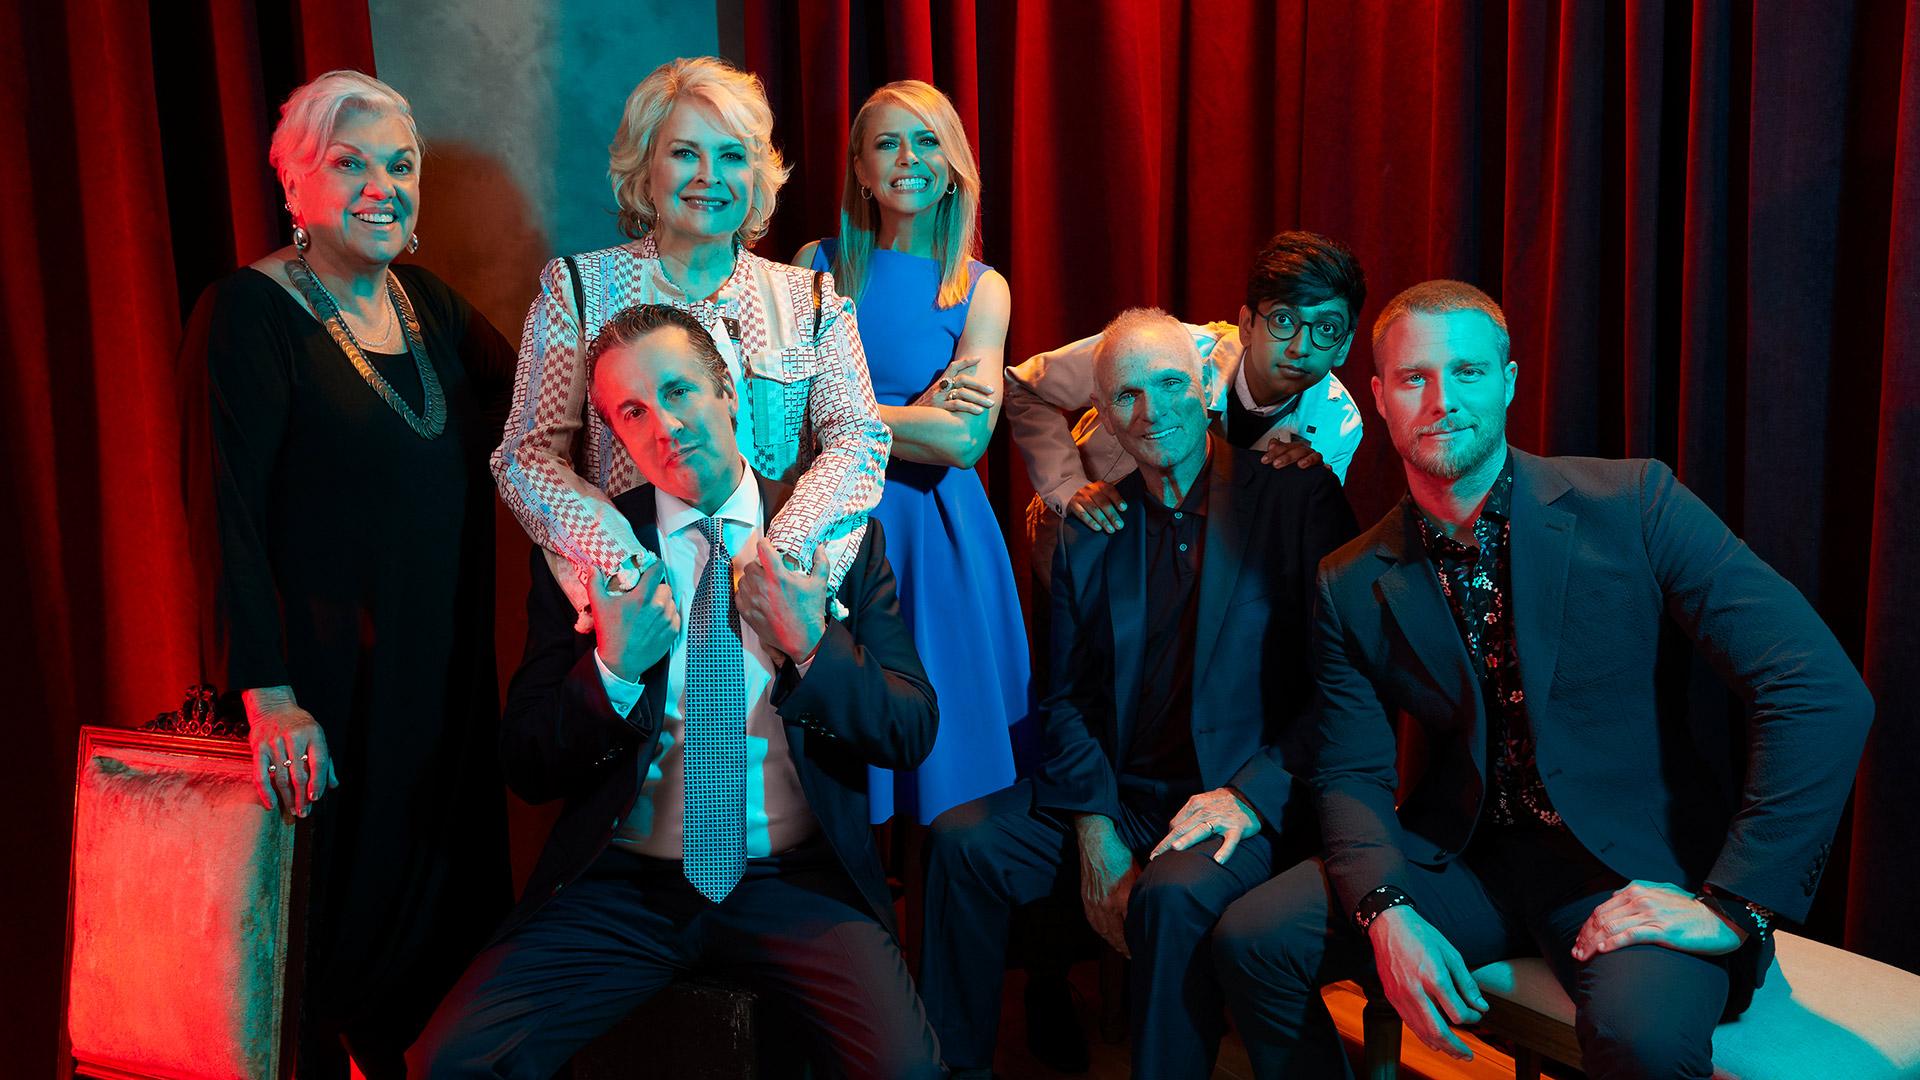 Tyne Daly, Candice Bergen, Grant Shaud, Faith Ford, Nik Dodani, Joe Regalbuto, and Jake McDorman